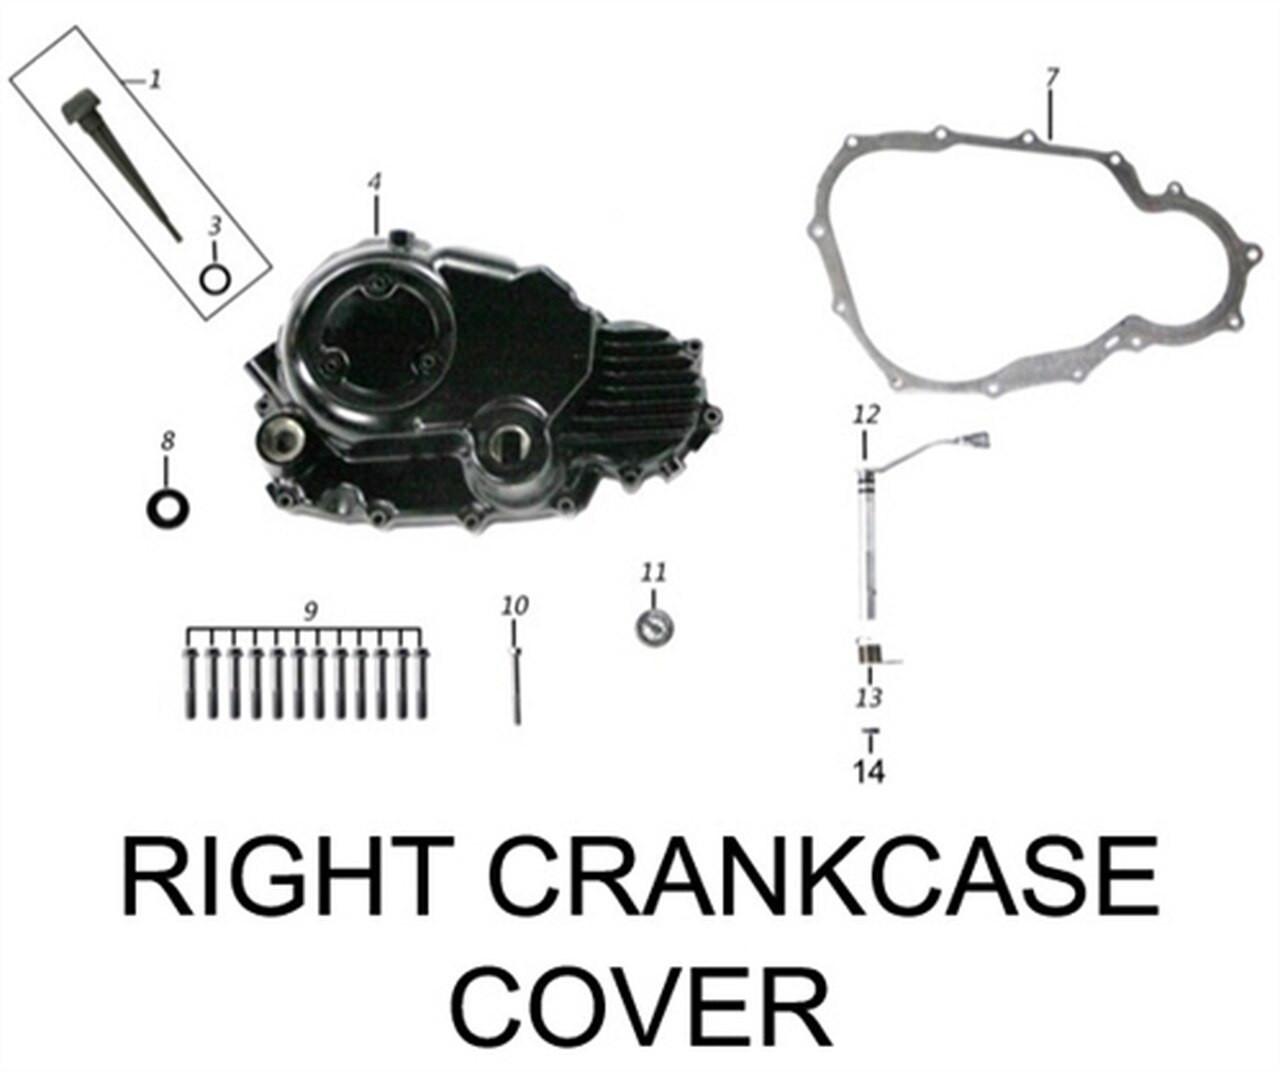 ENGINE CRANKCASE, INNER RIGHT